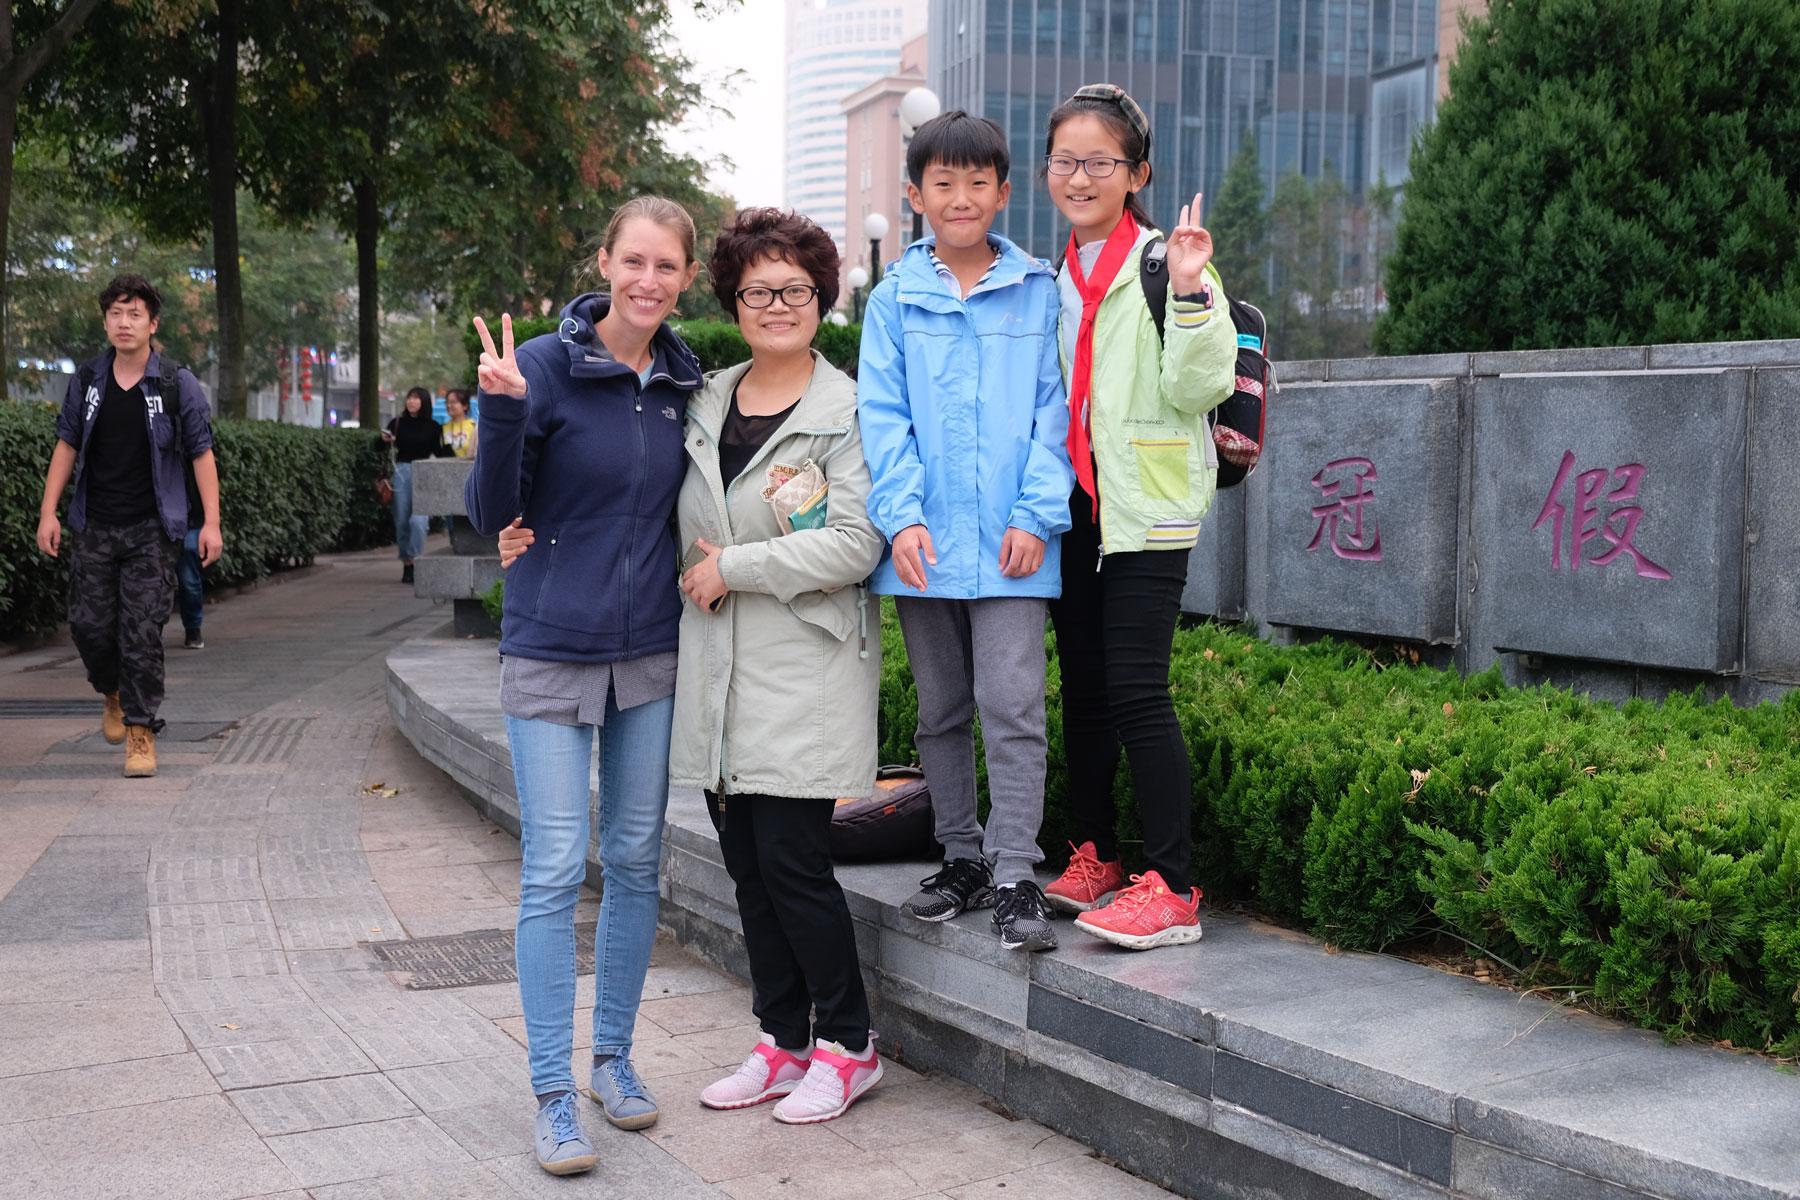 Leo mit Sunny, Yang Yang und Baby in Qingdao